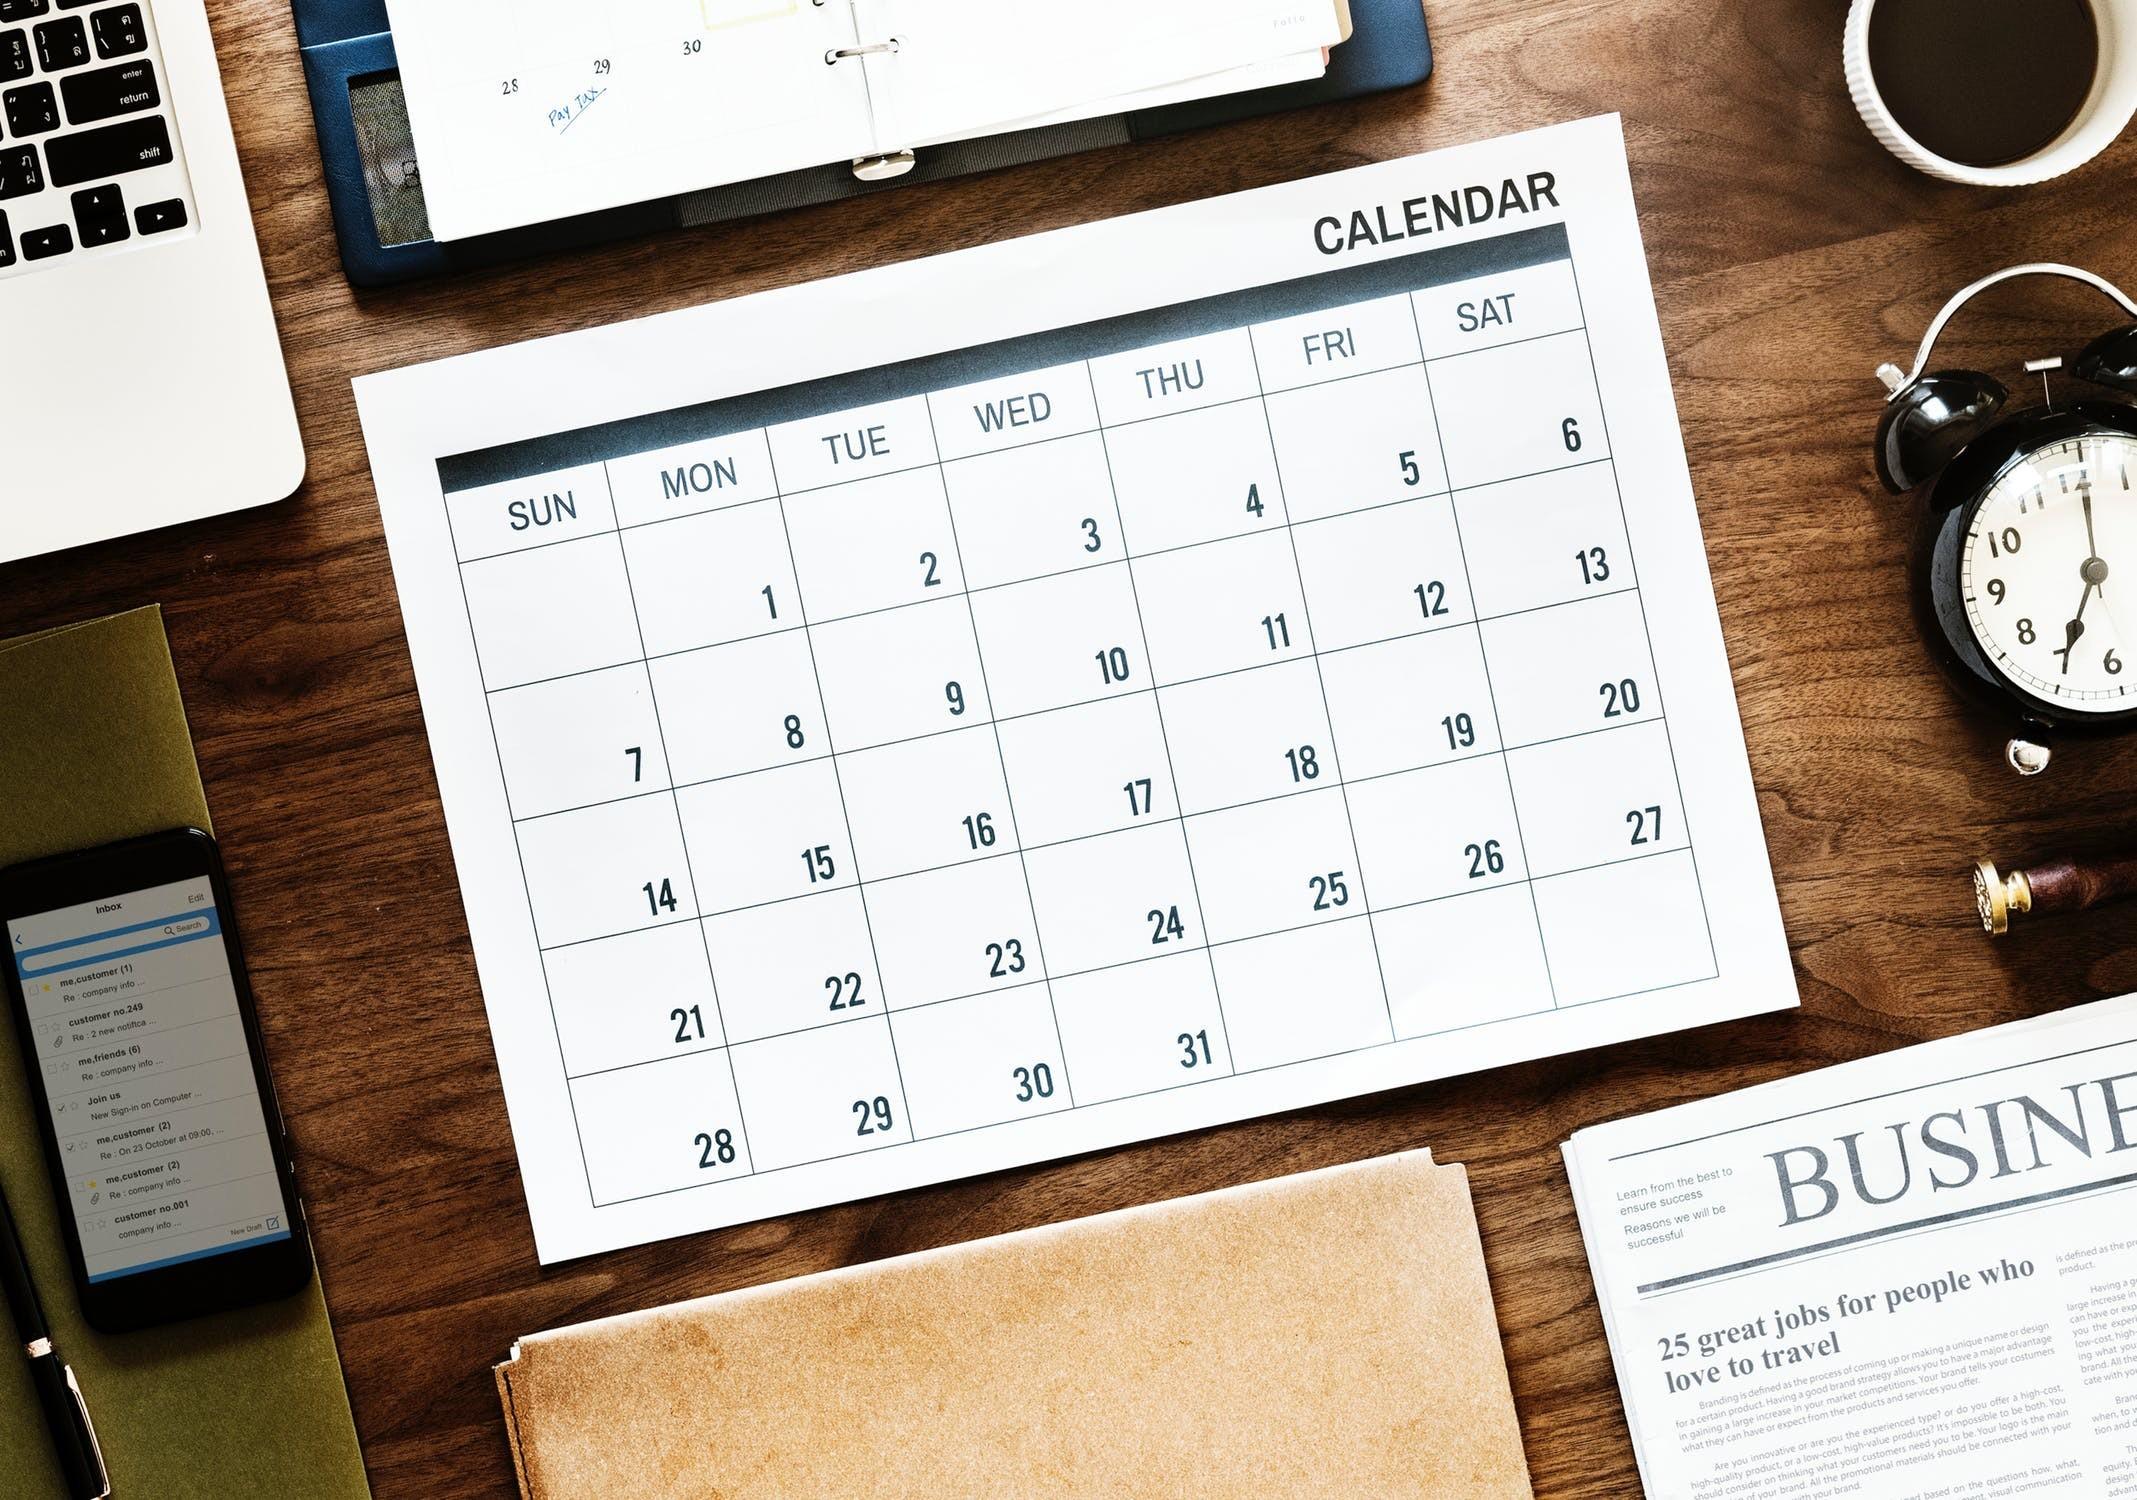 free great calendar march 2019 actual fill in calendar 2019 lara expolicenciaslatam of free great calendar march 2019